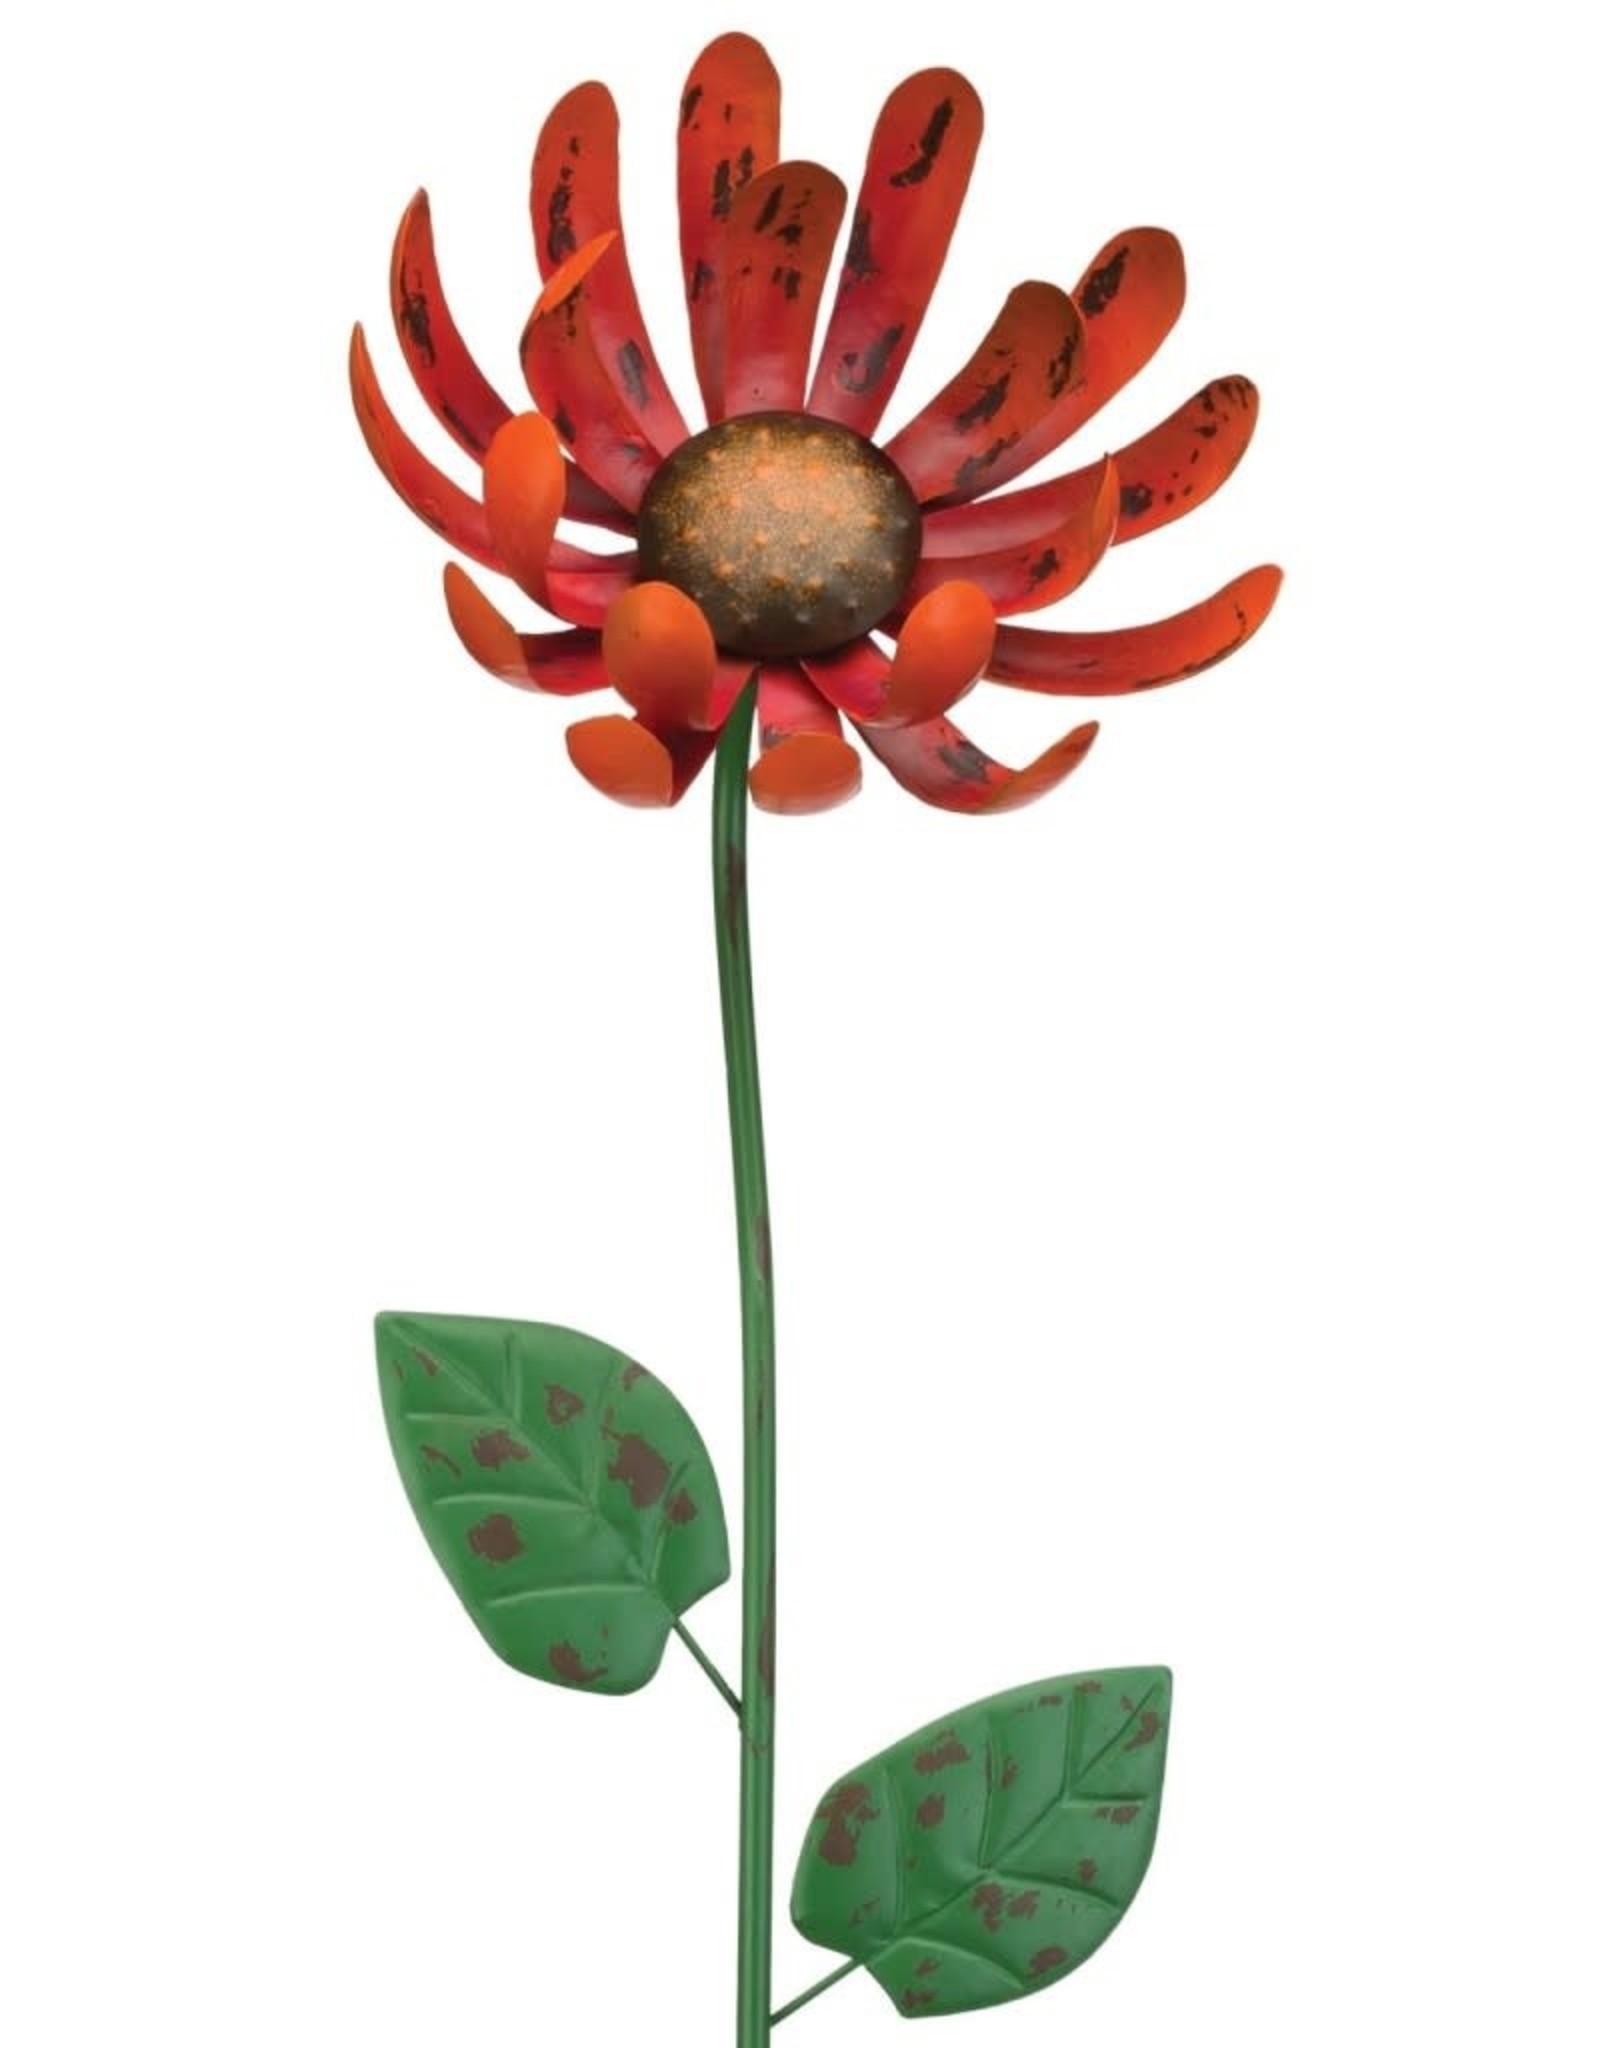 Rustic Flower Stake - Mum 36''